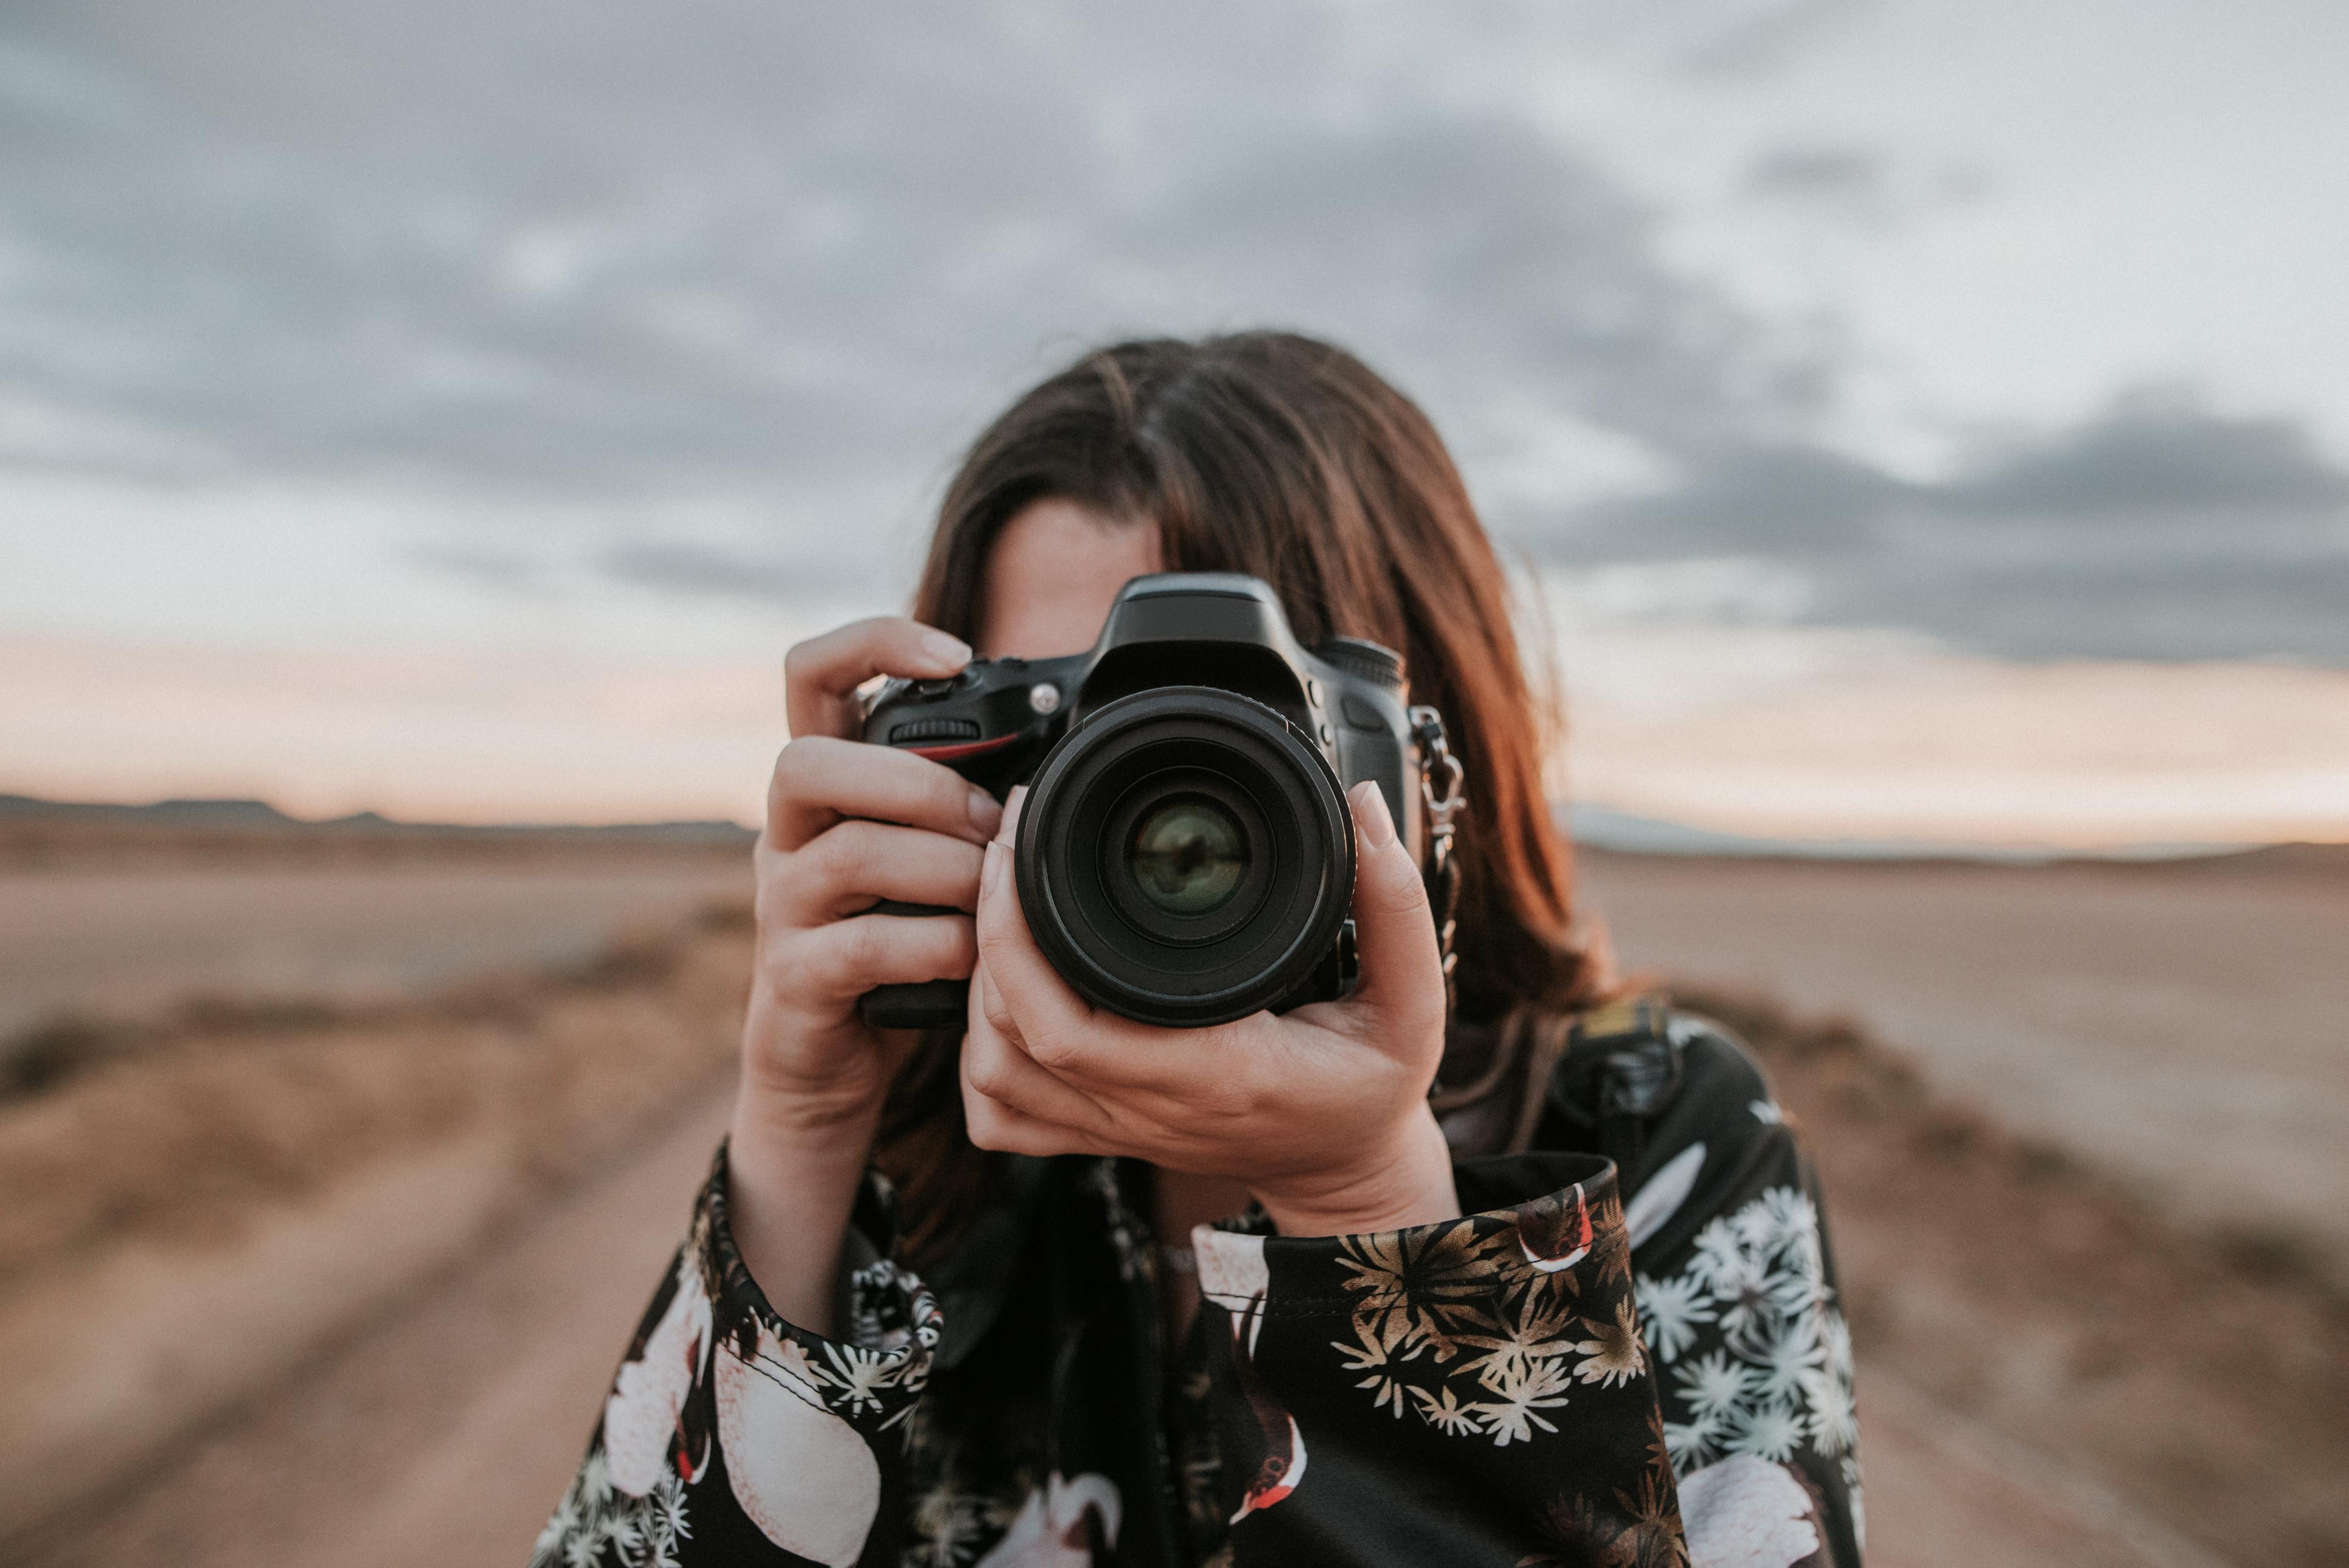 Worten retoma ciclo de workshops de fotografia com Canon